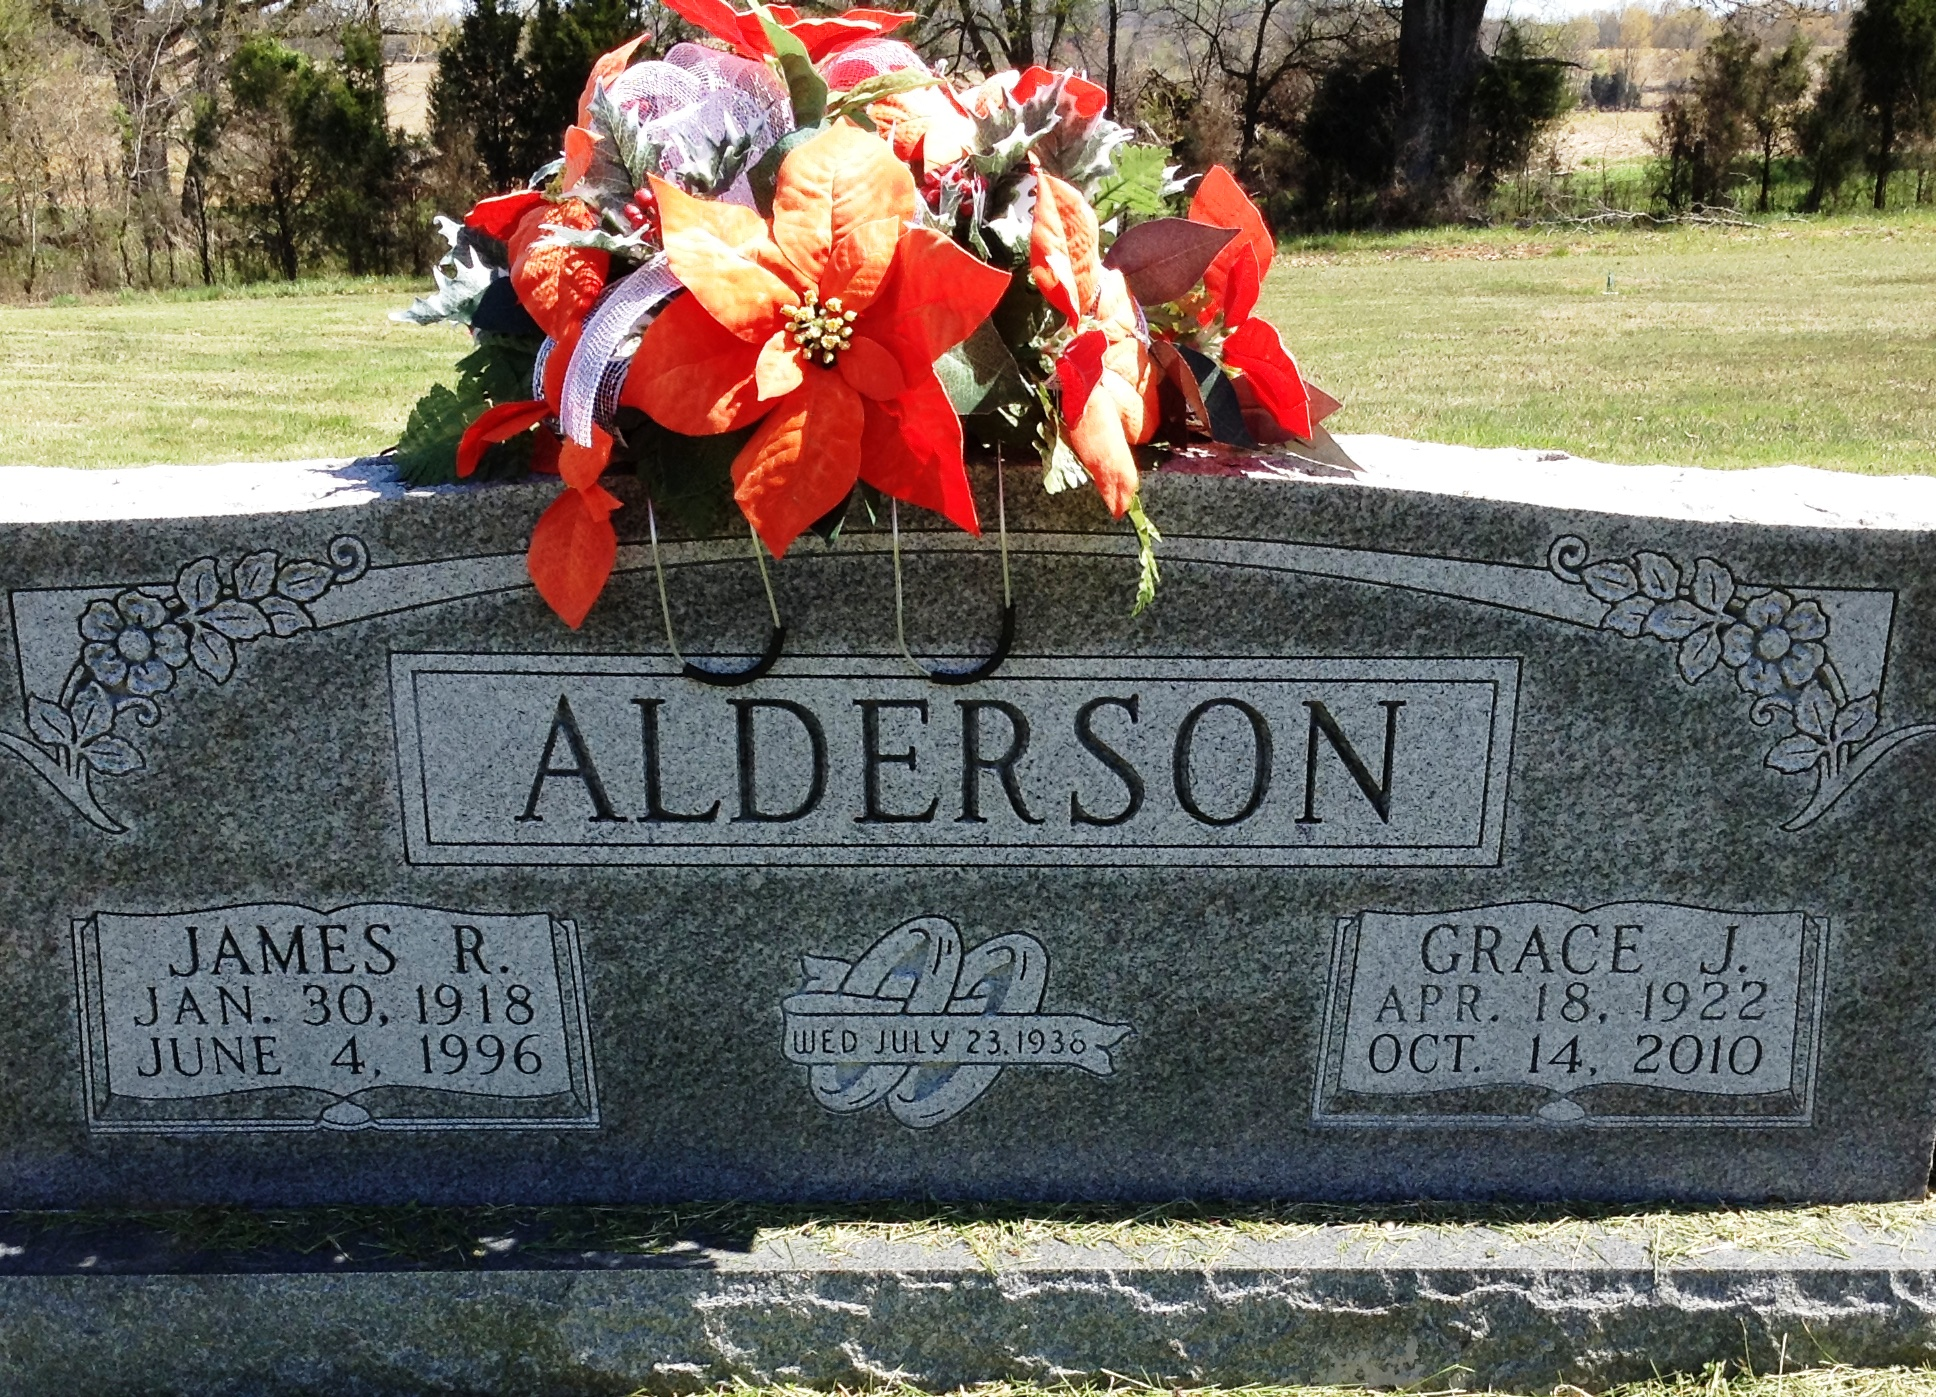 Rev James R Alderson